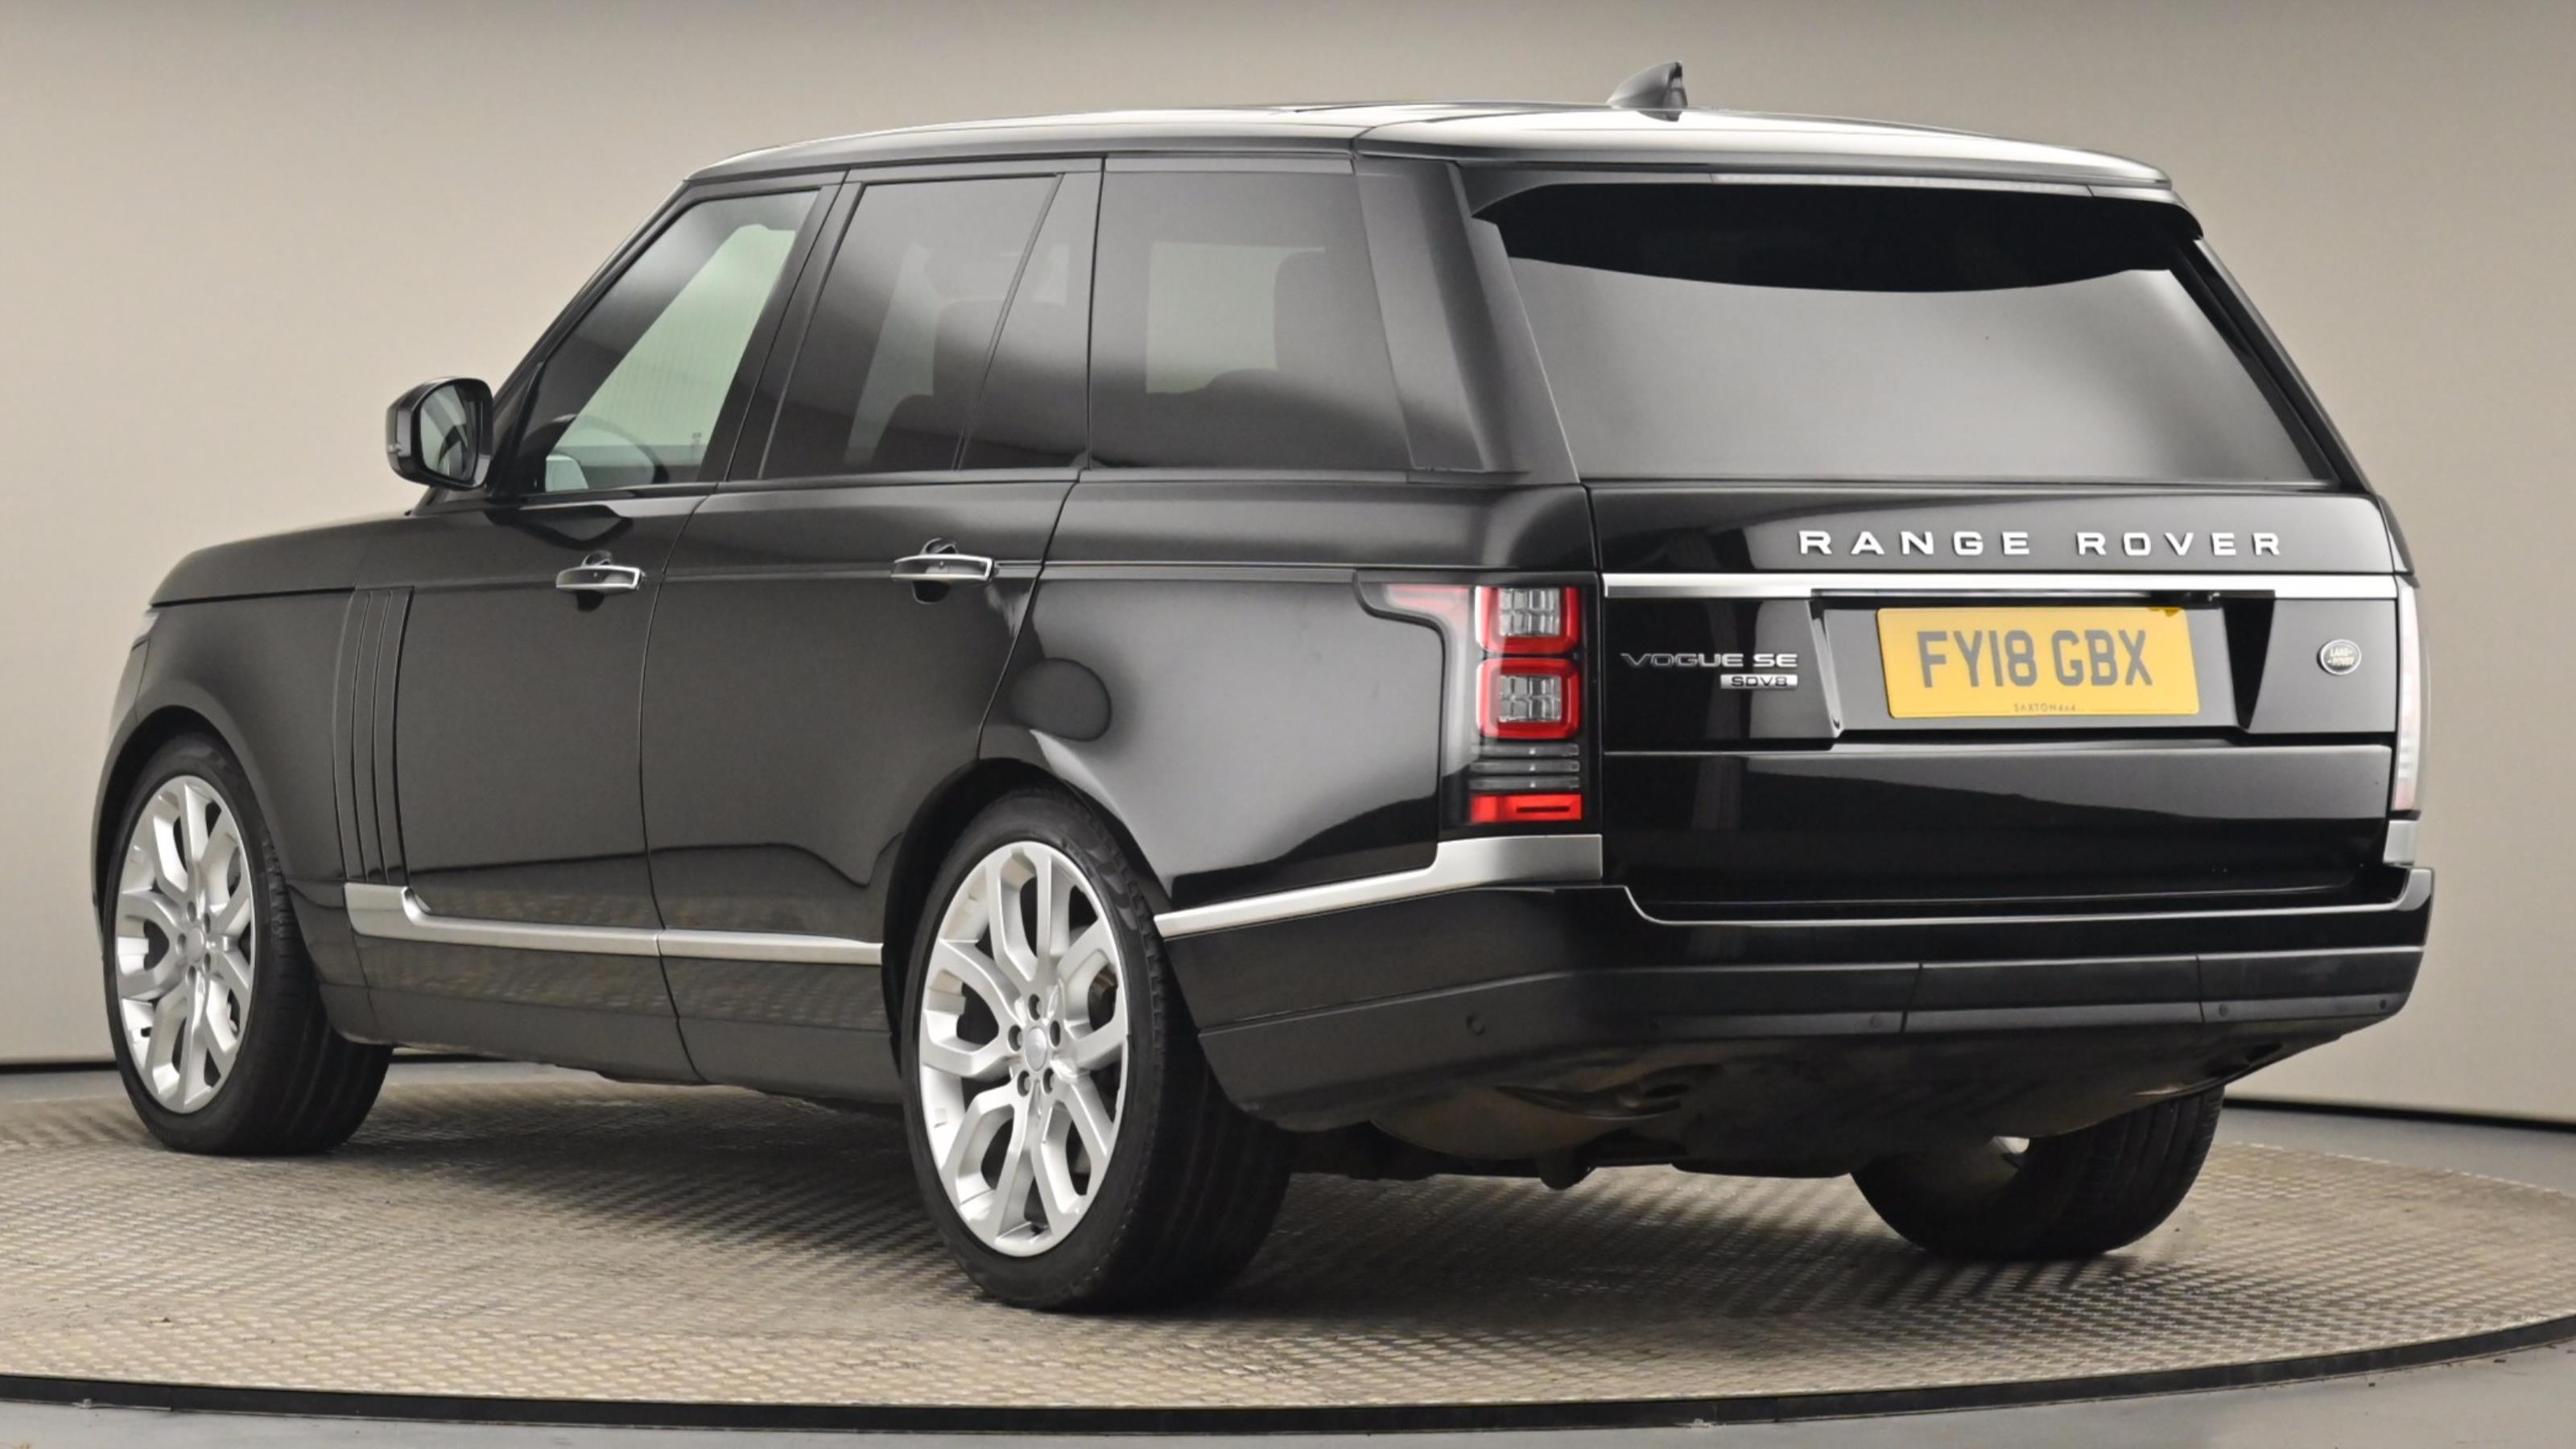 Used 2018 Land Rover RANGE ROVER 4.4 SDV8 Vogue SE 4dr Auto BLACK at Saxton4x4